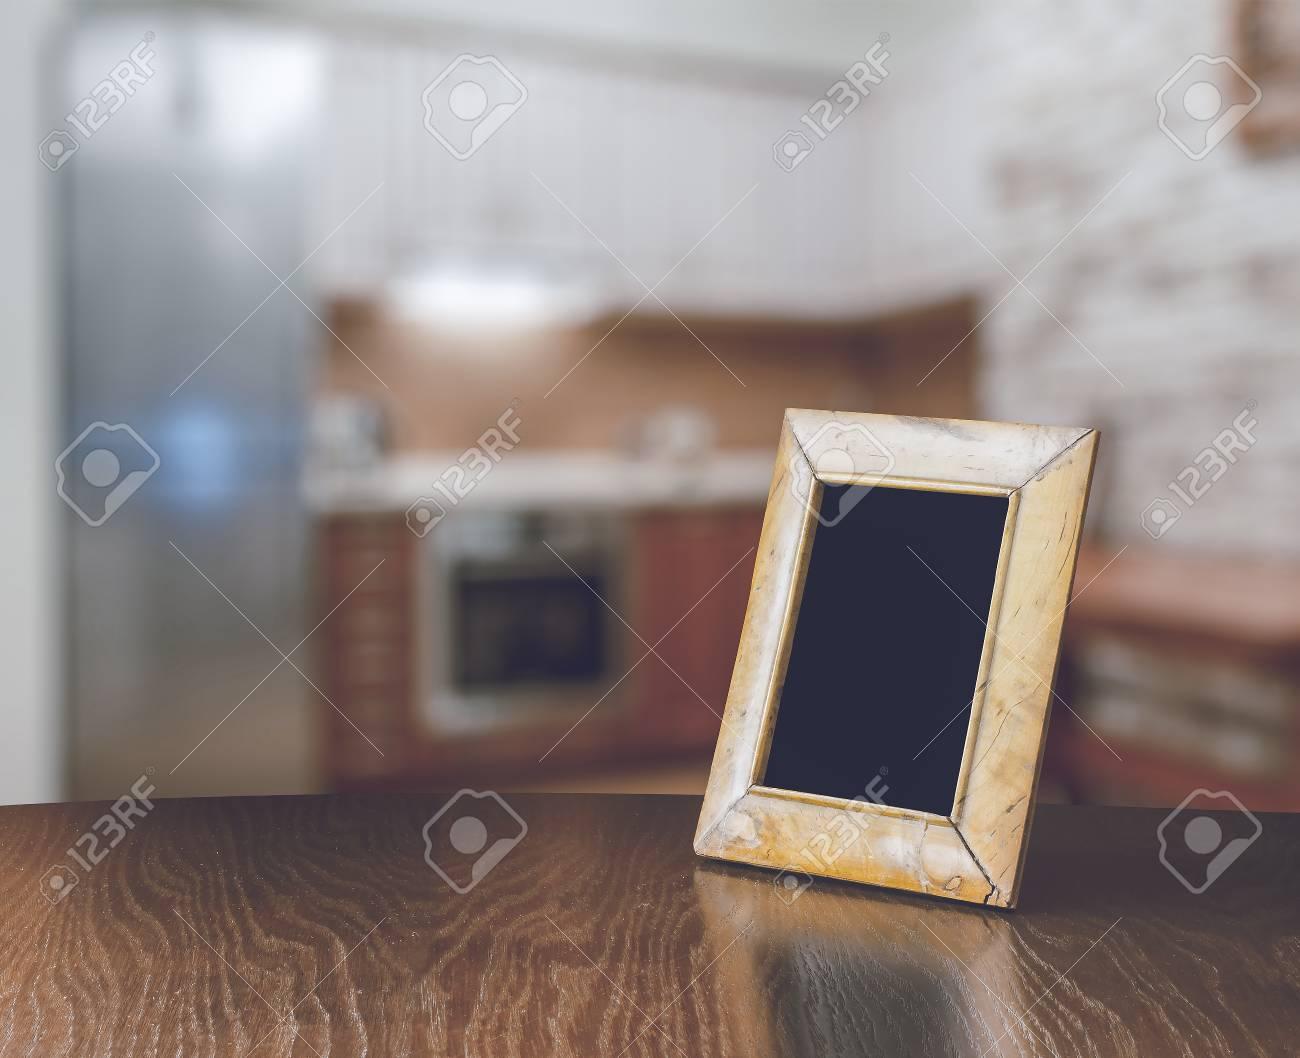 Ziemlich Küche Bilderrahmen Fotos - Bilderrahmen Ideen - szurop.info